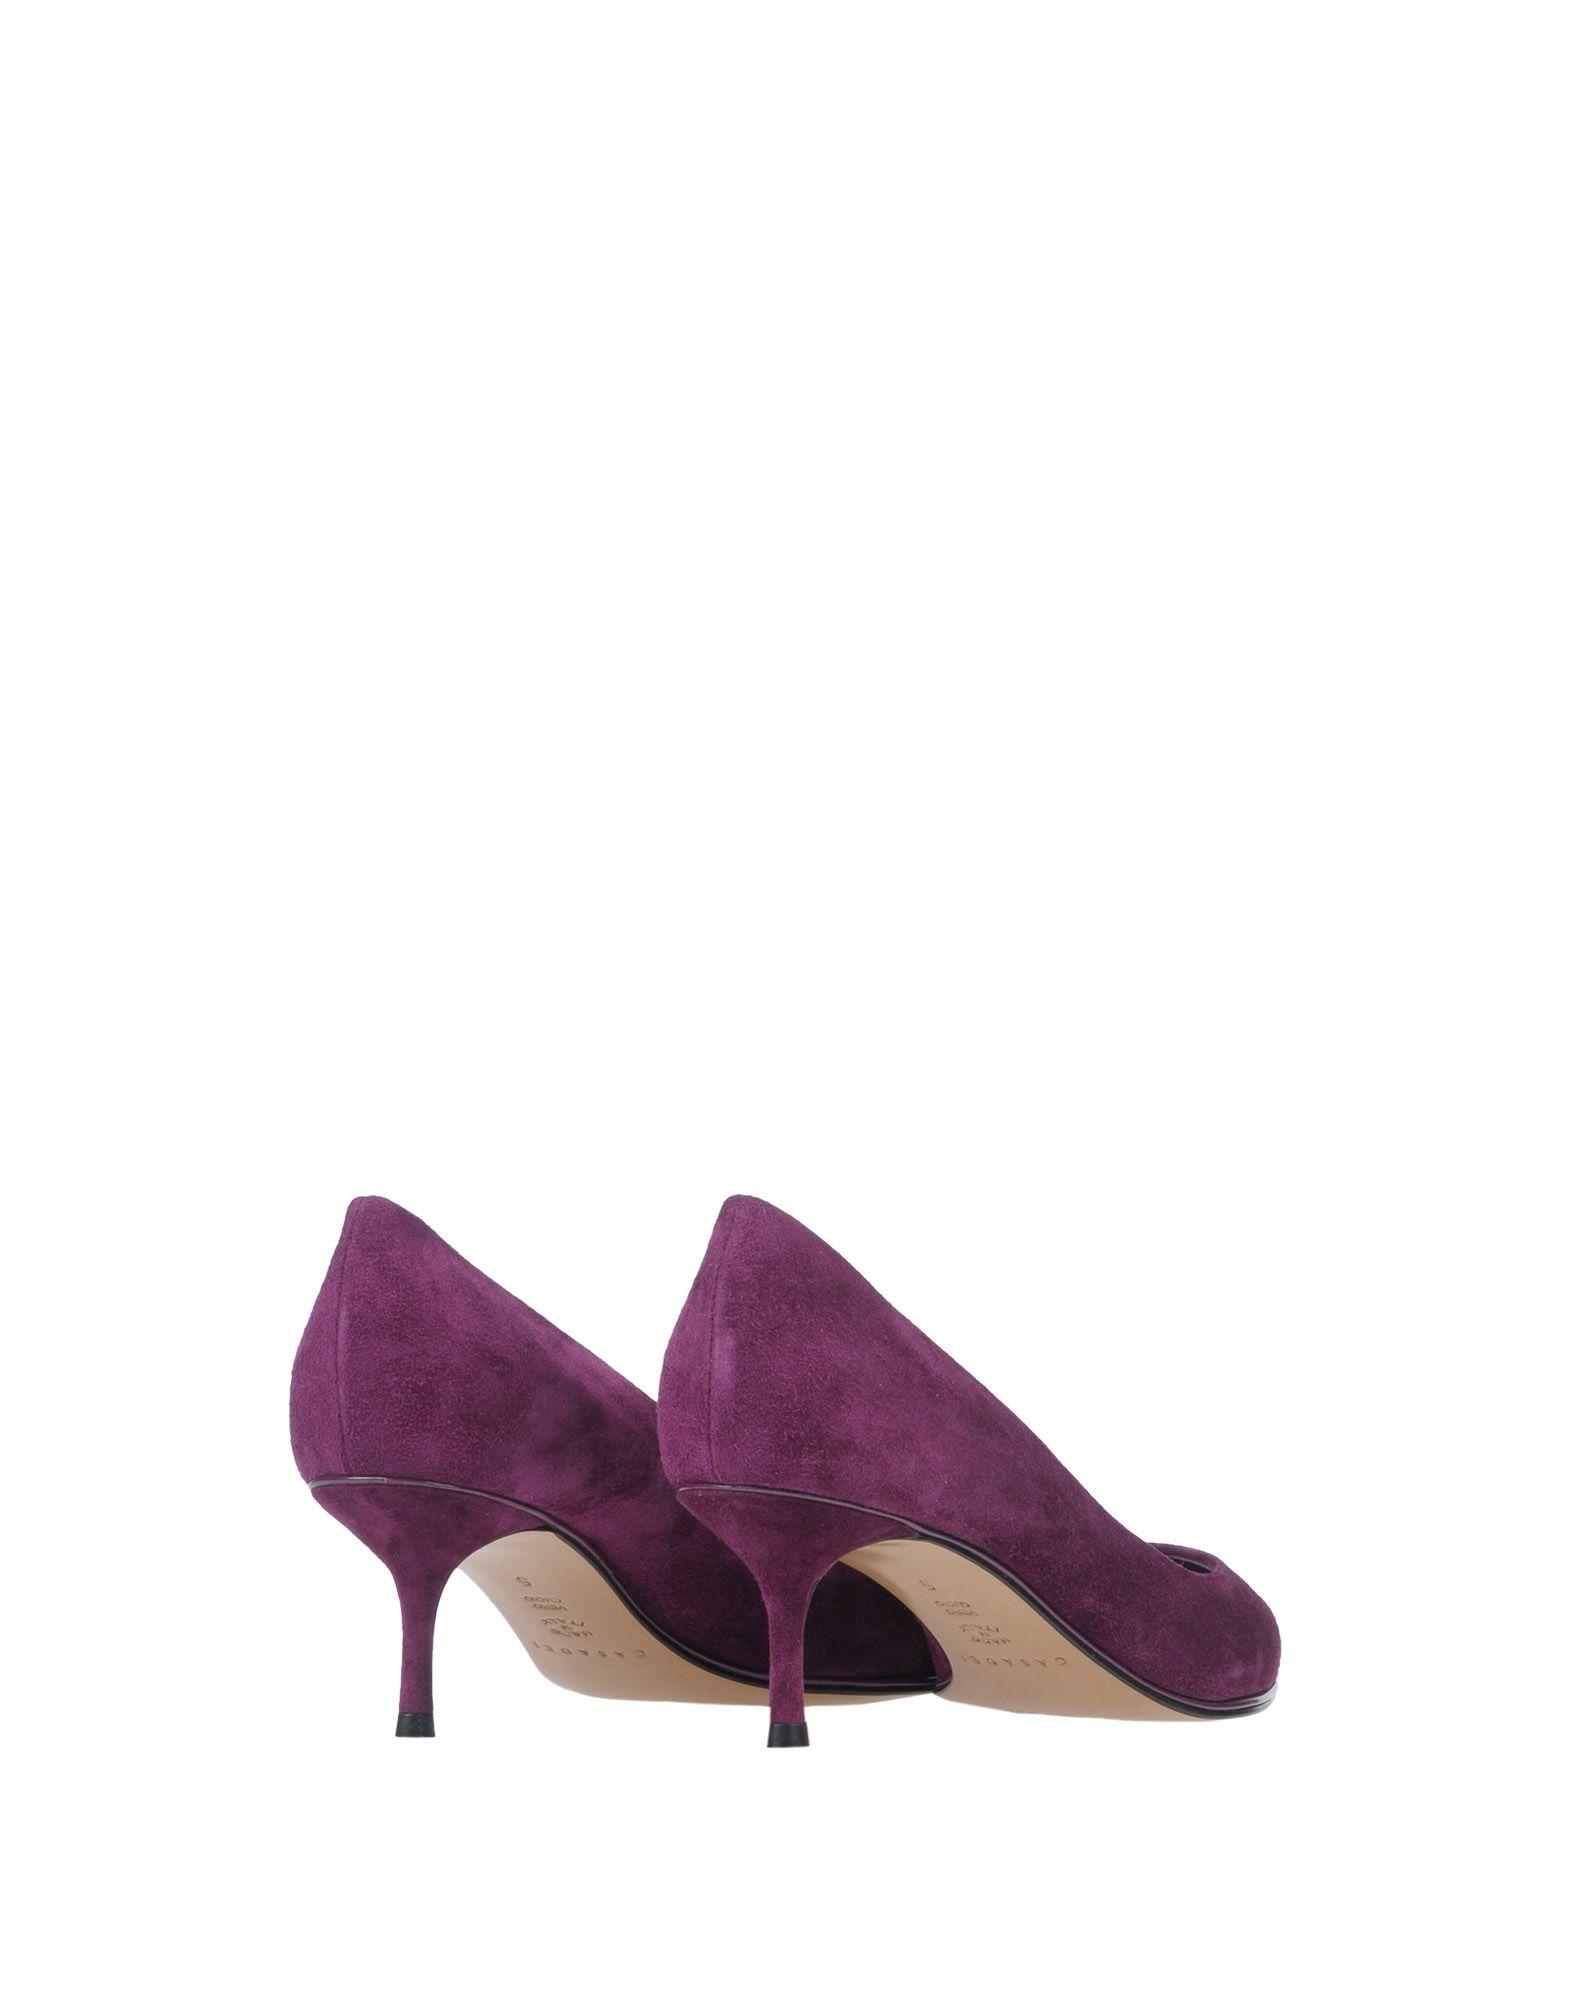 Haltbare Mode Pumps billige Schuhe Casadei Pumps Mode Damen  11398436CH Heiße Schuhe 0c8b17